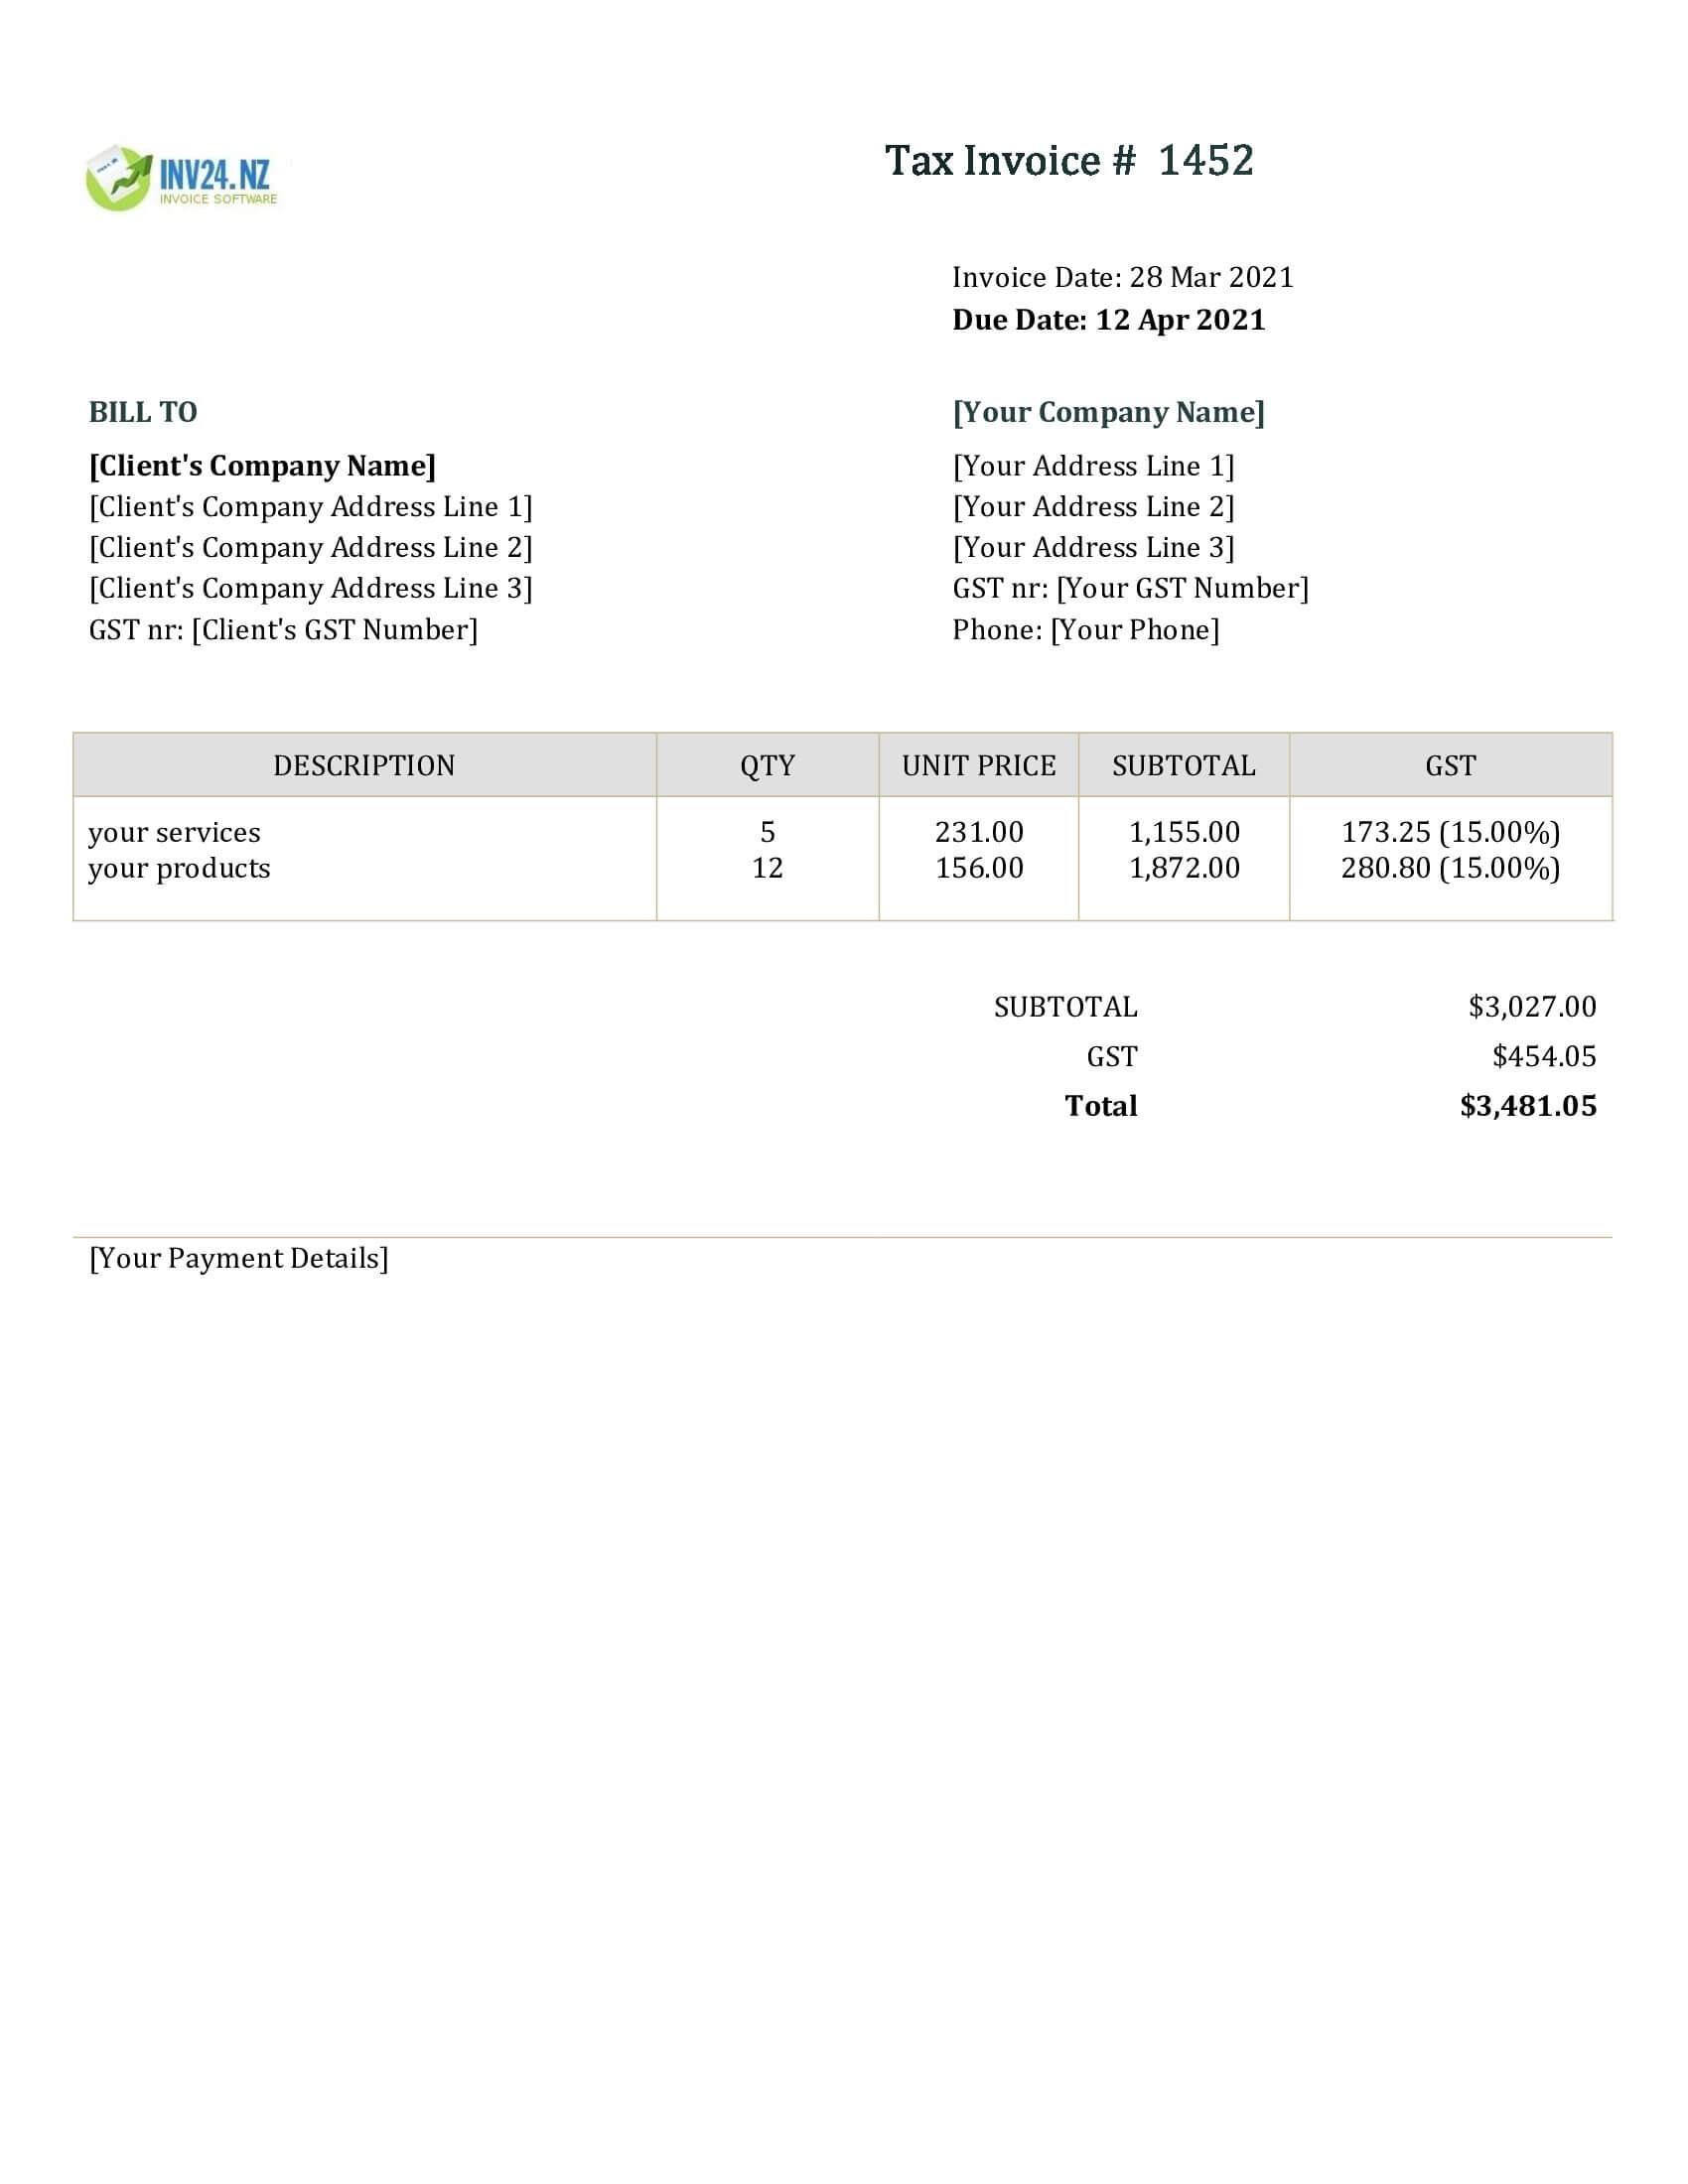 nz invoice template